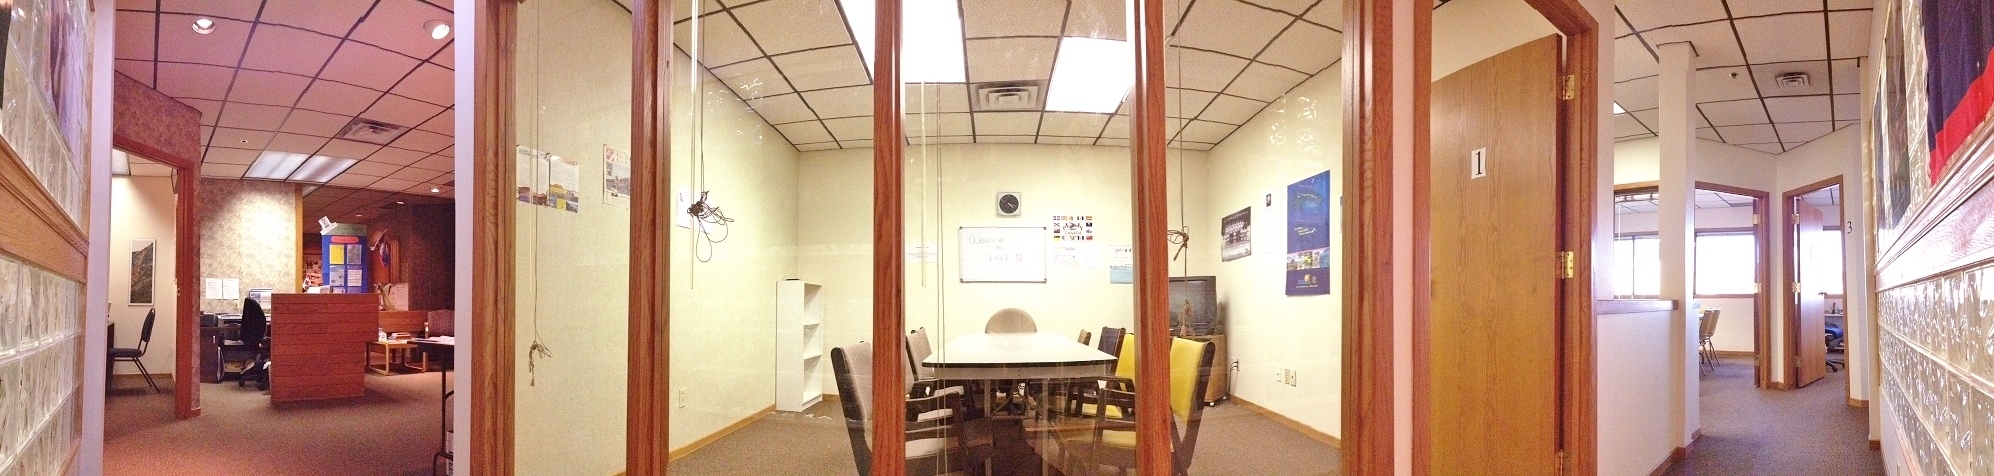 IGK new student room